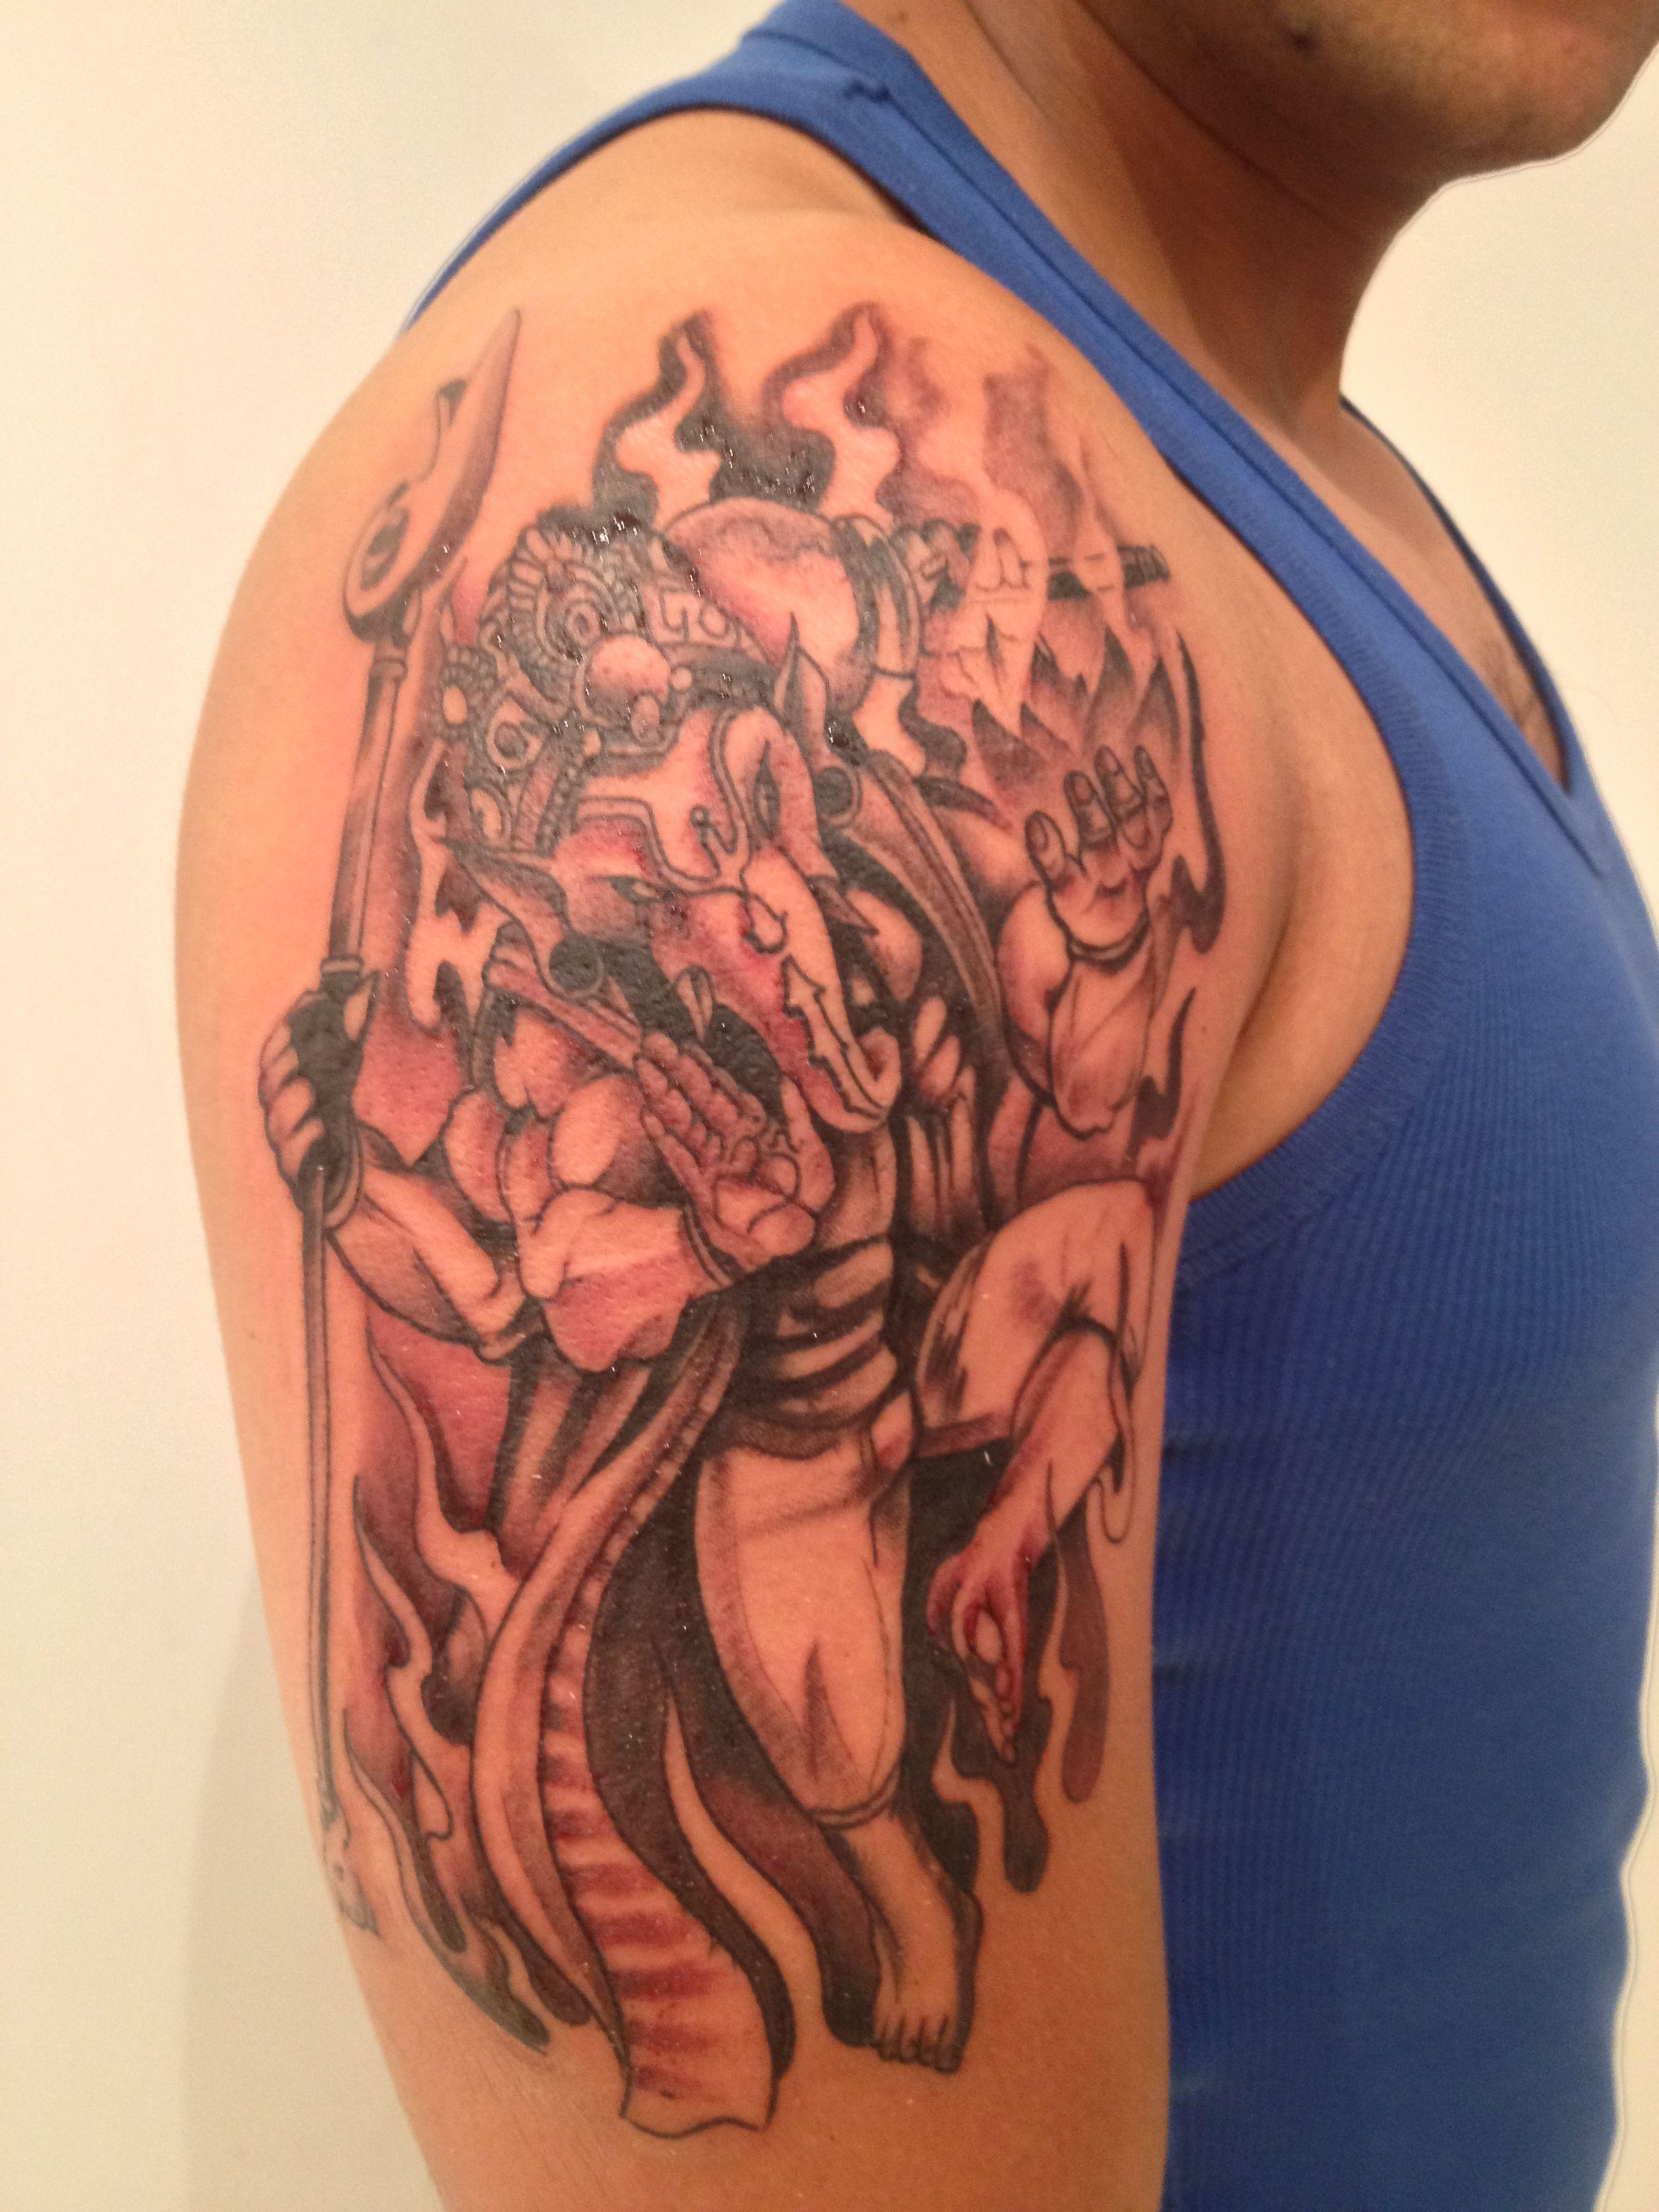 11 ganesha tattoo designs ideas and samples - Ganesha Tattoo Ganesh Naga Ink God